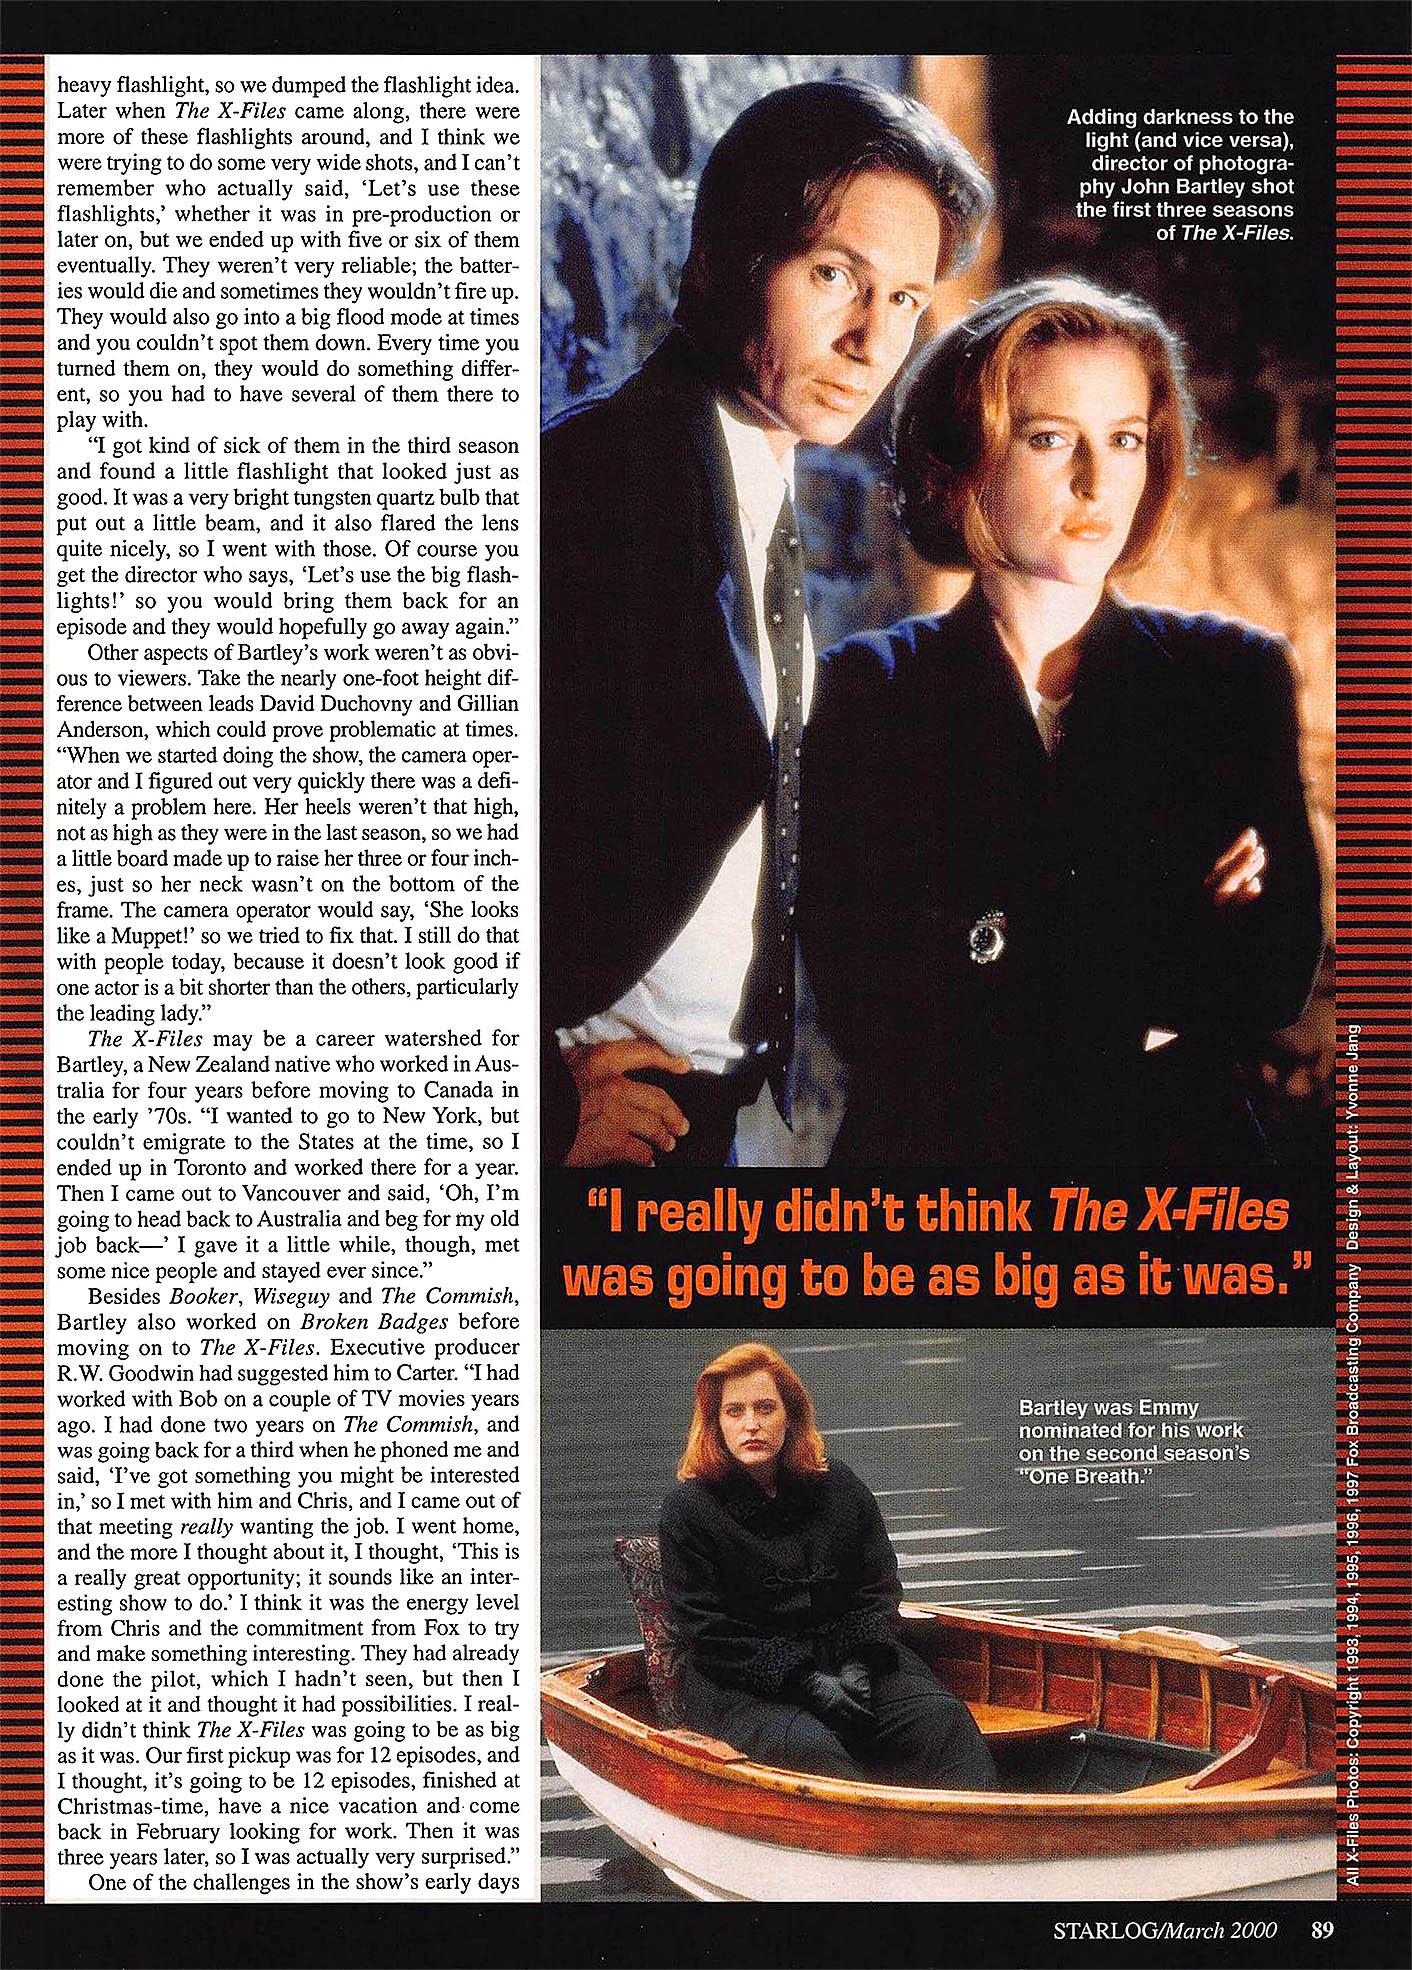 Starlog 272 2000 03 X-Files-2.jpg